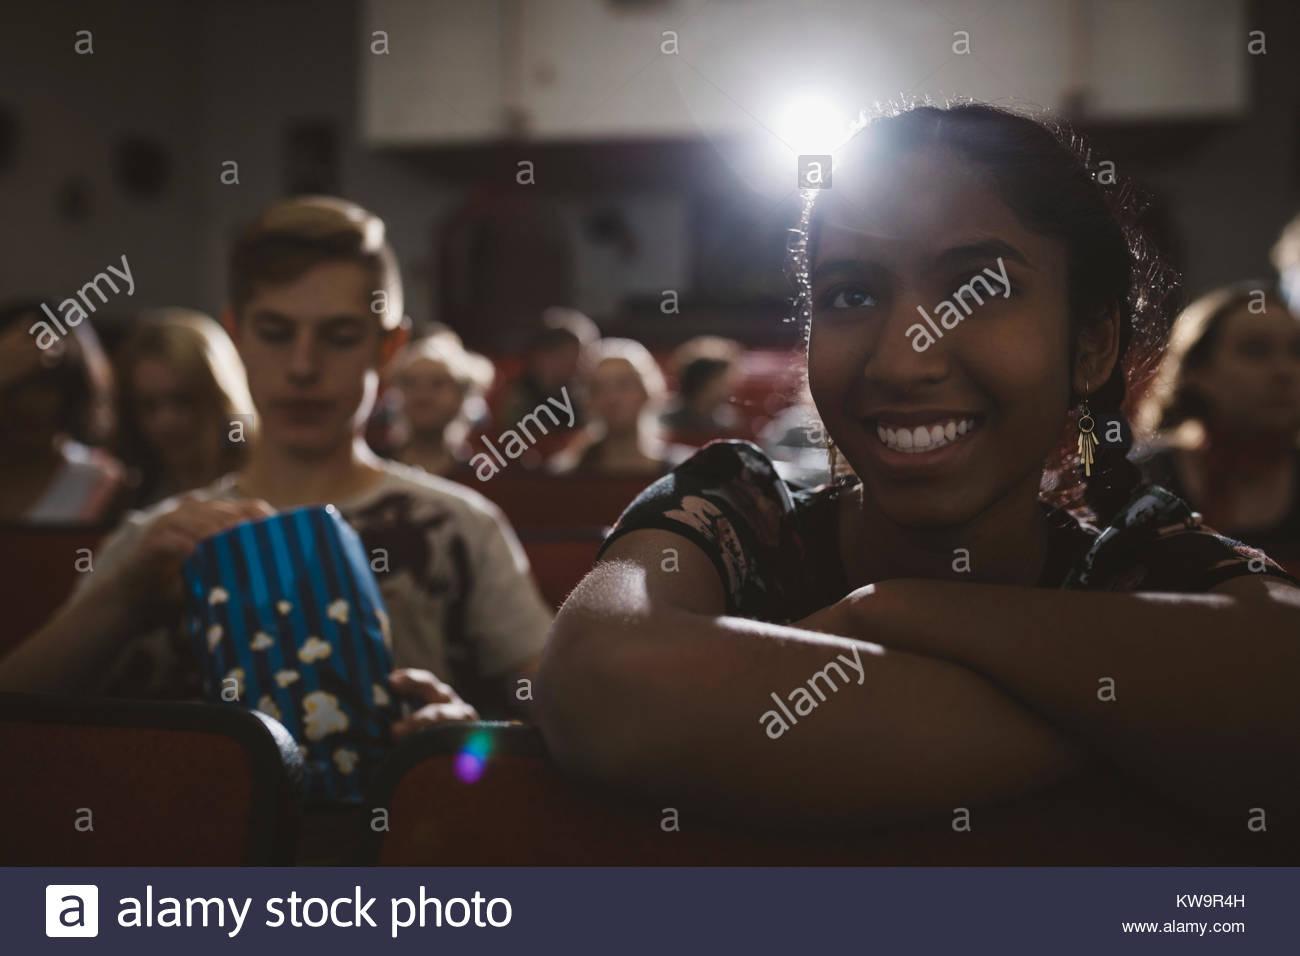 Smiling indian tween girl watching movie in dark movie theater stock smiling indian tween girl watching movie in dark movie theater altavistaventures Images